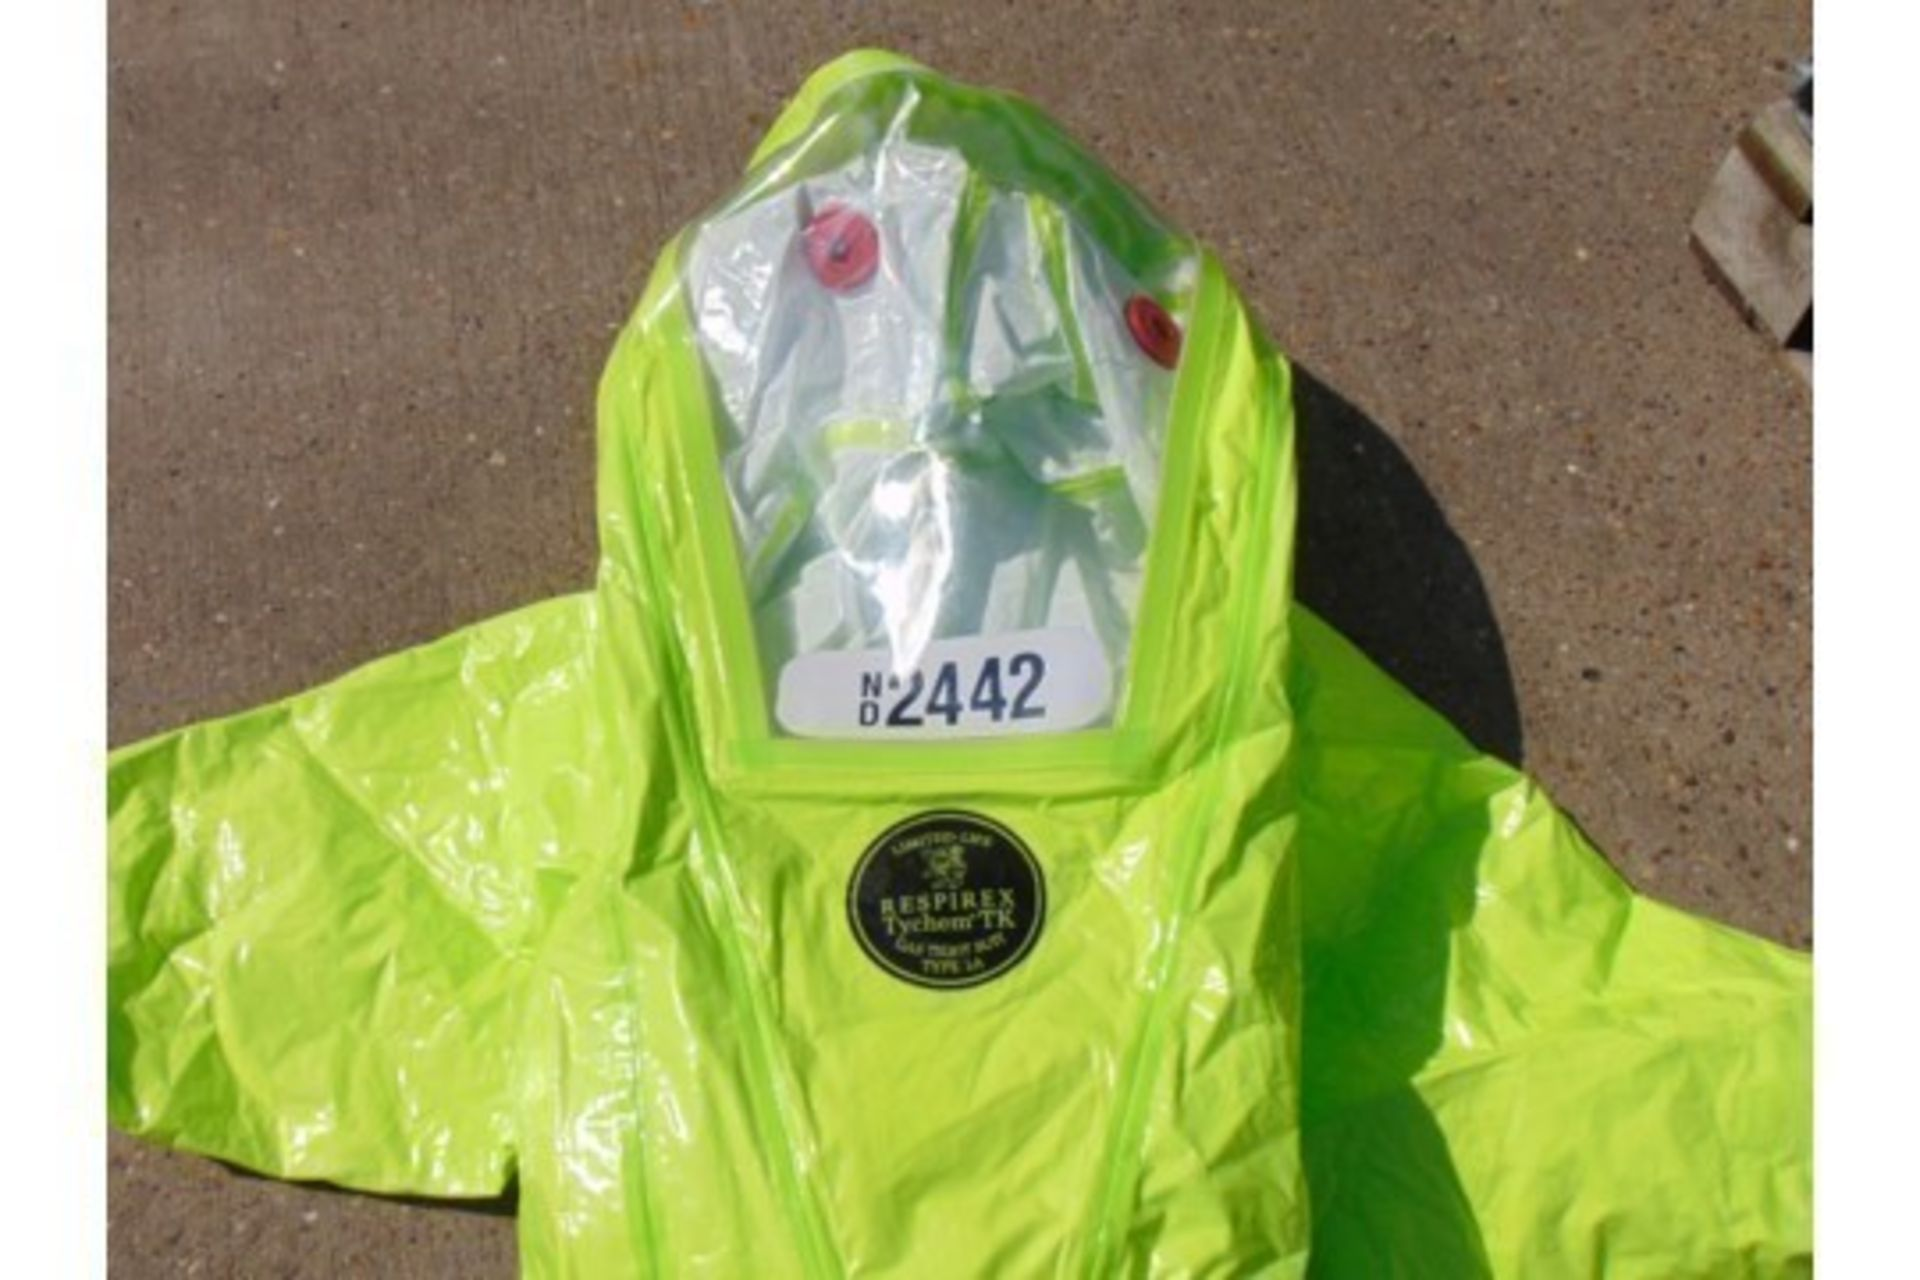 Lot 26810 - Q10 x Unissued Respirex Tychem TK Gas-Tight Hazmat Suit. Size Medium